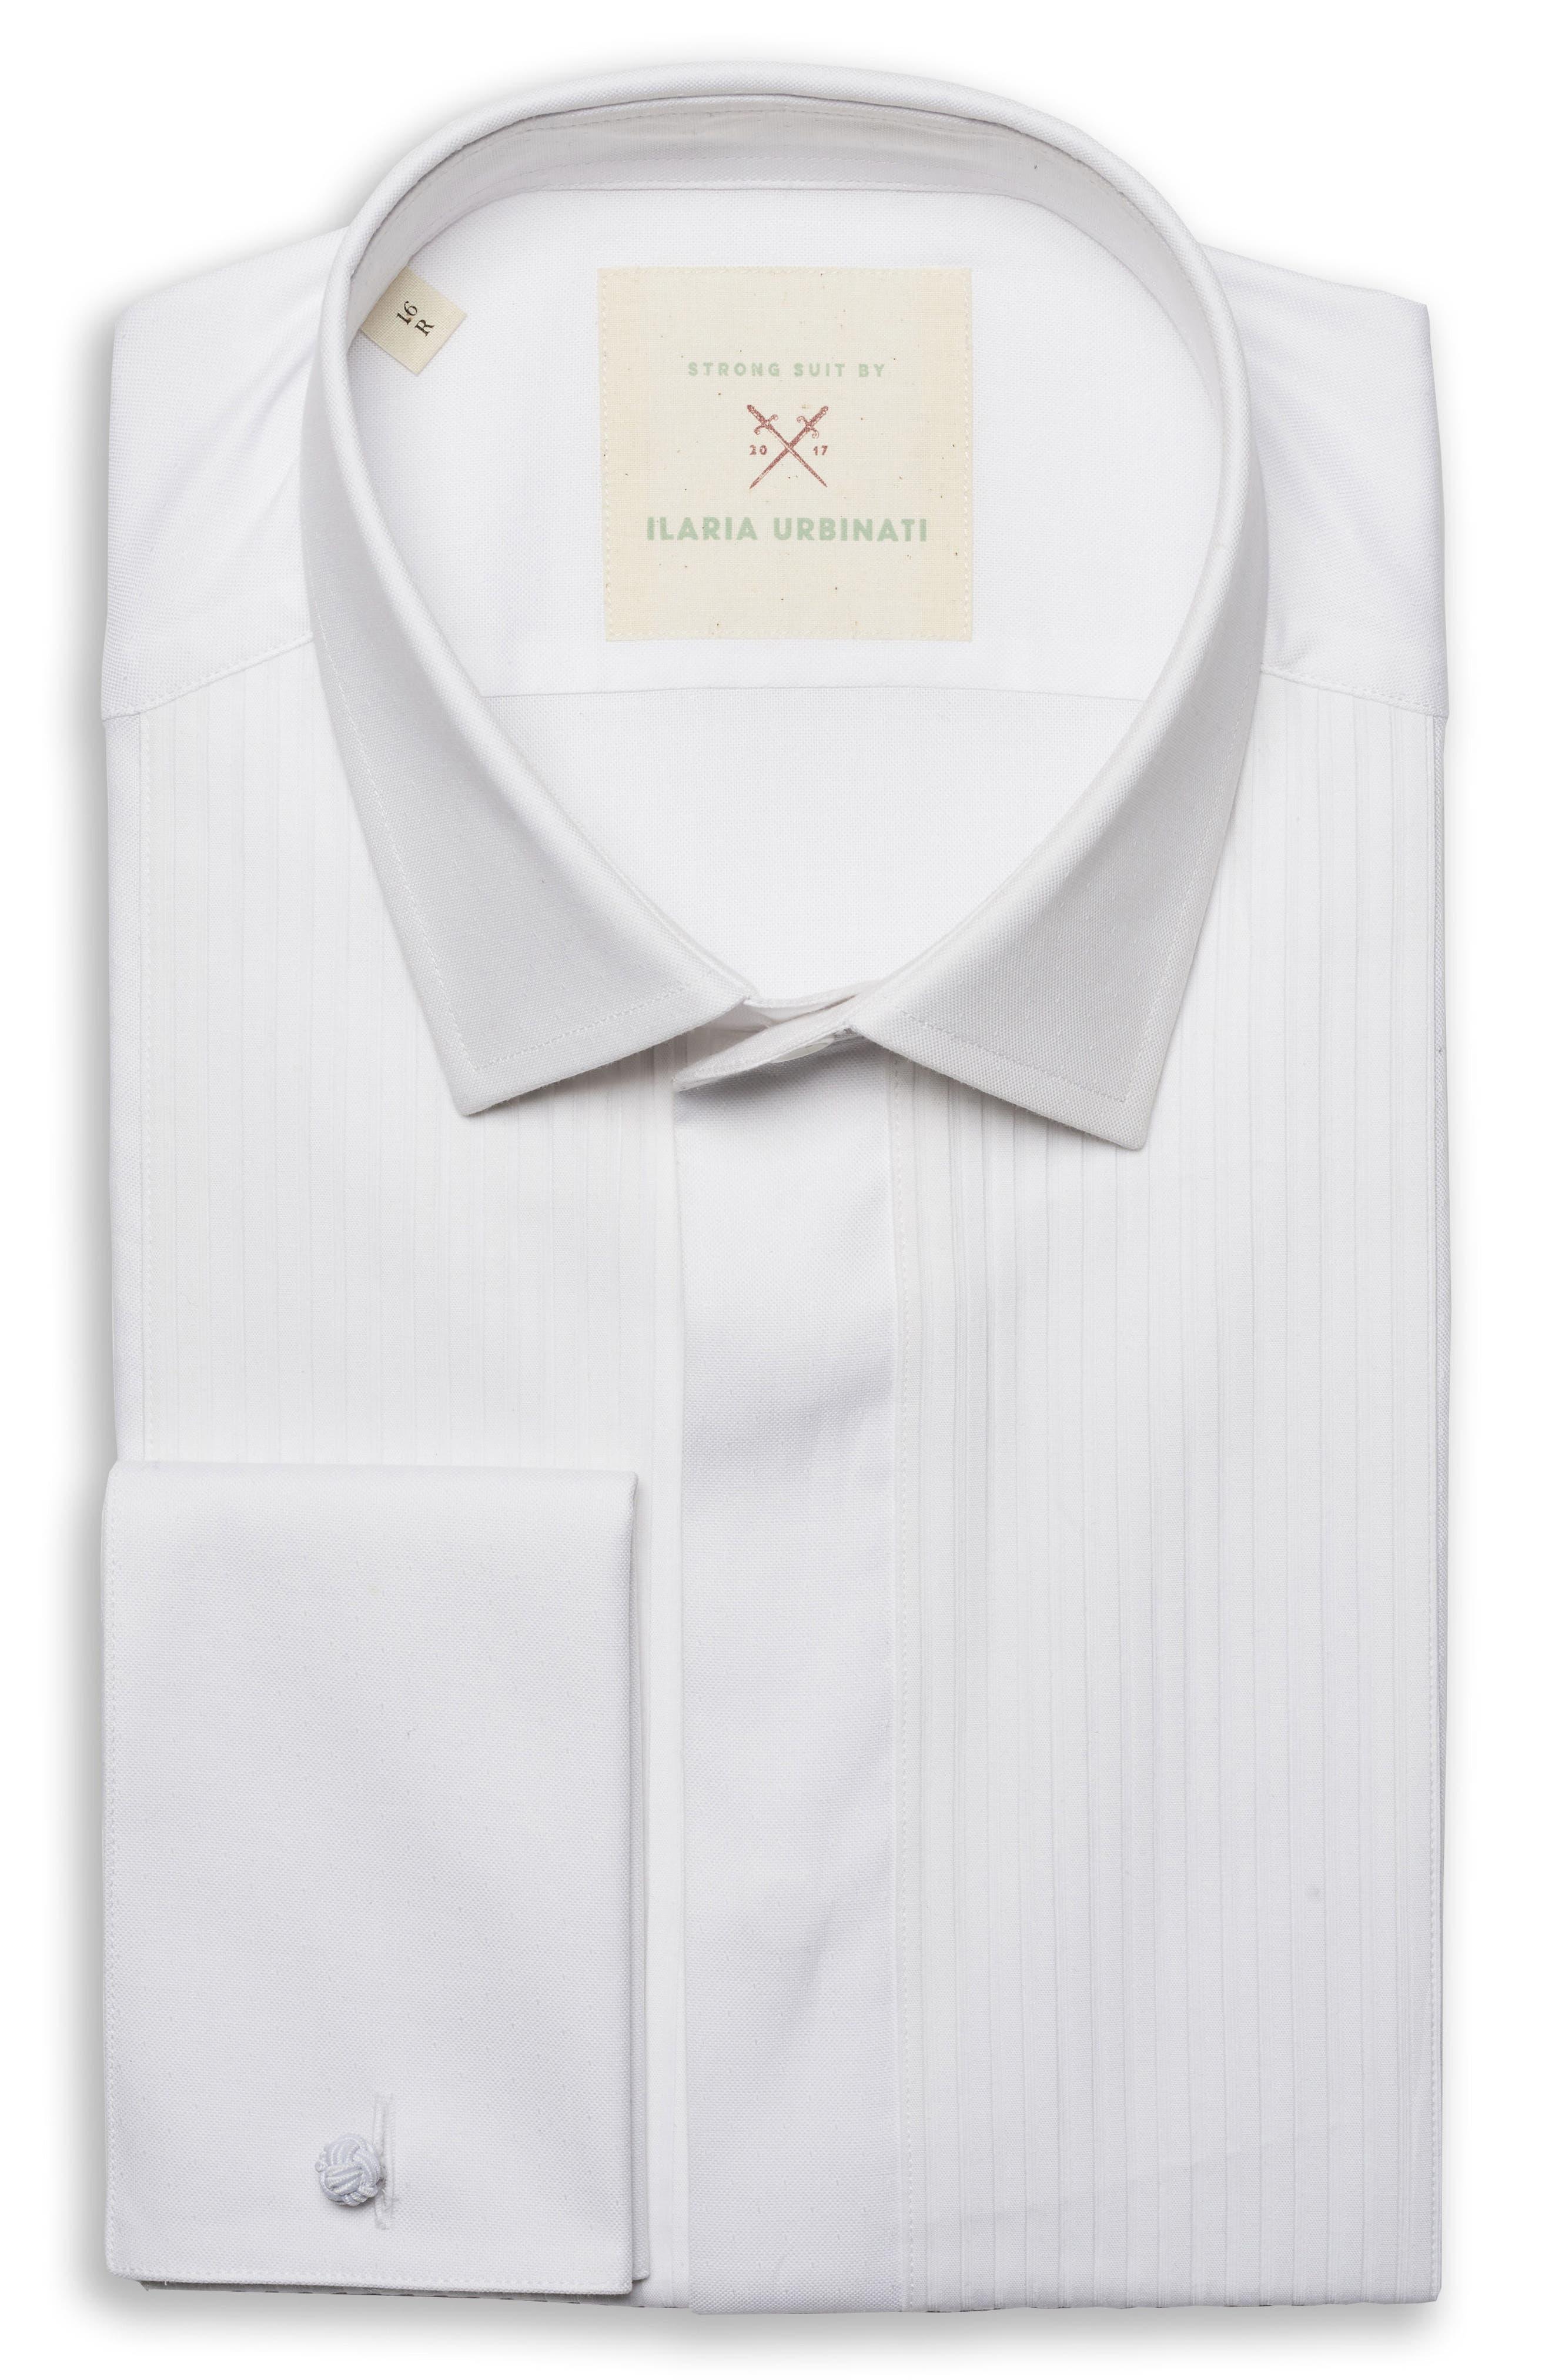 by Ilaria Urbinati Slim Fit Tuxedo Shirt,                             Main thumbnail 1, color,                             106